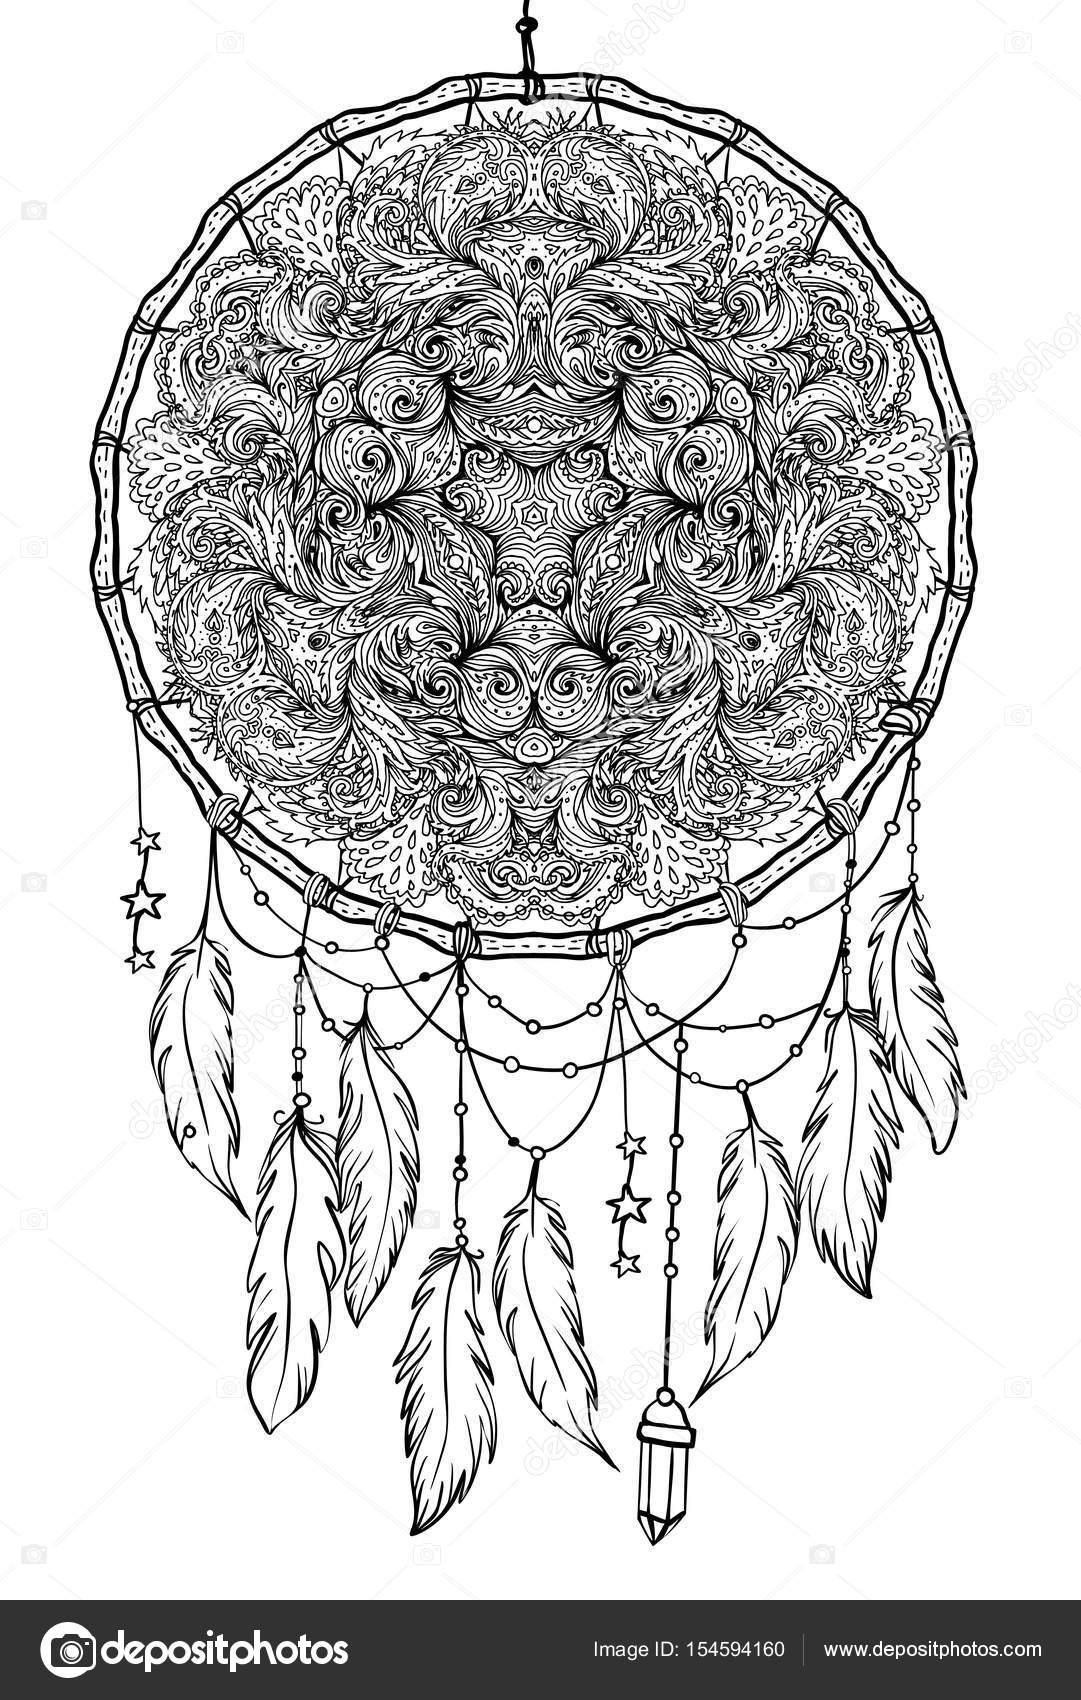 Imágenes: indios para dibujar | Mano dibujada dreamcatcher de ...